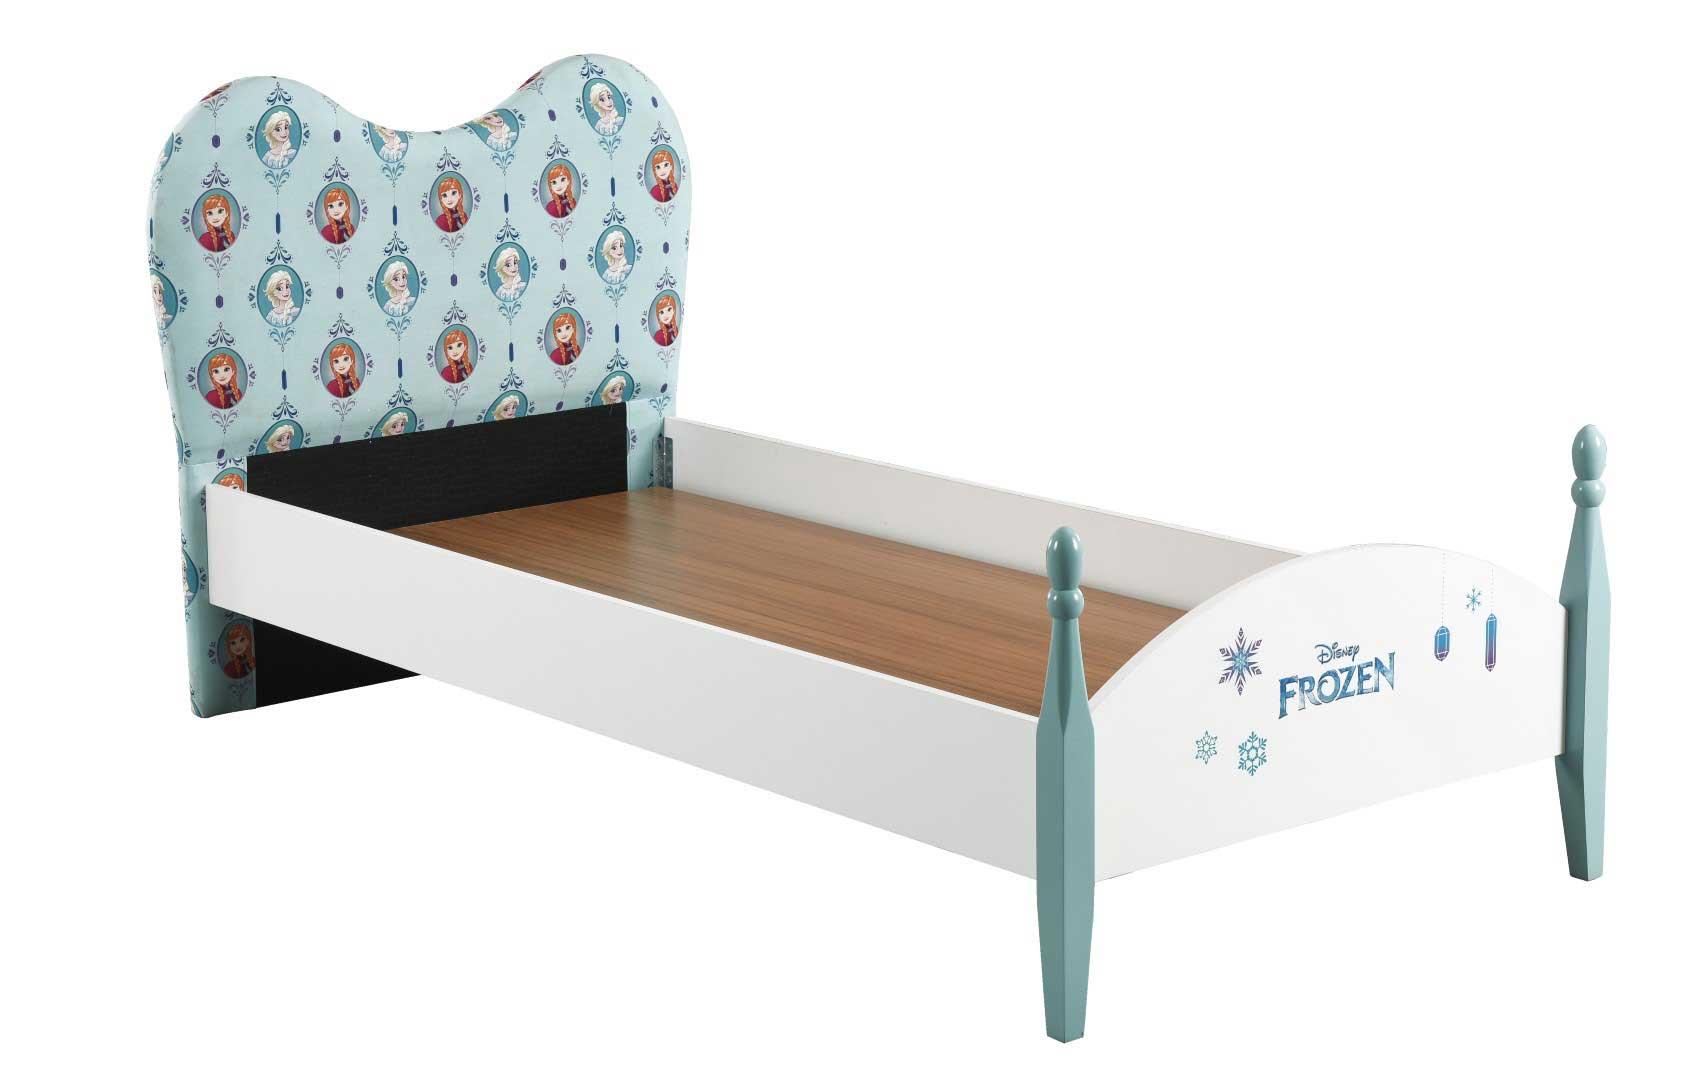 Eiskönigin: ANNA und ELSA Kinderzimmer-Set, 3-tlg.